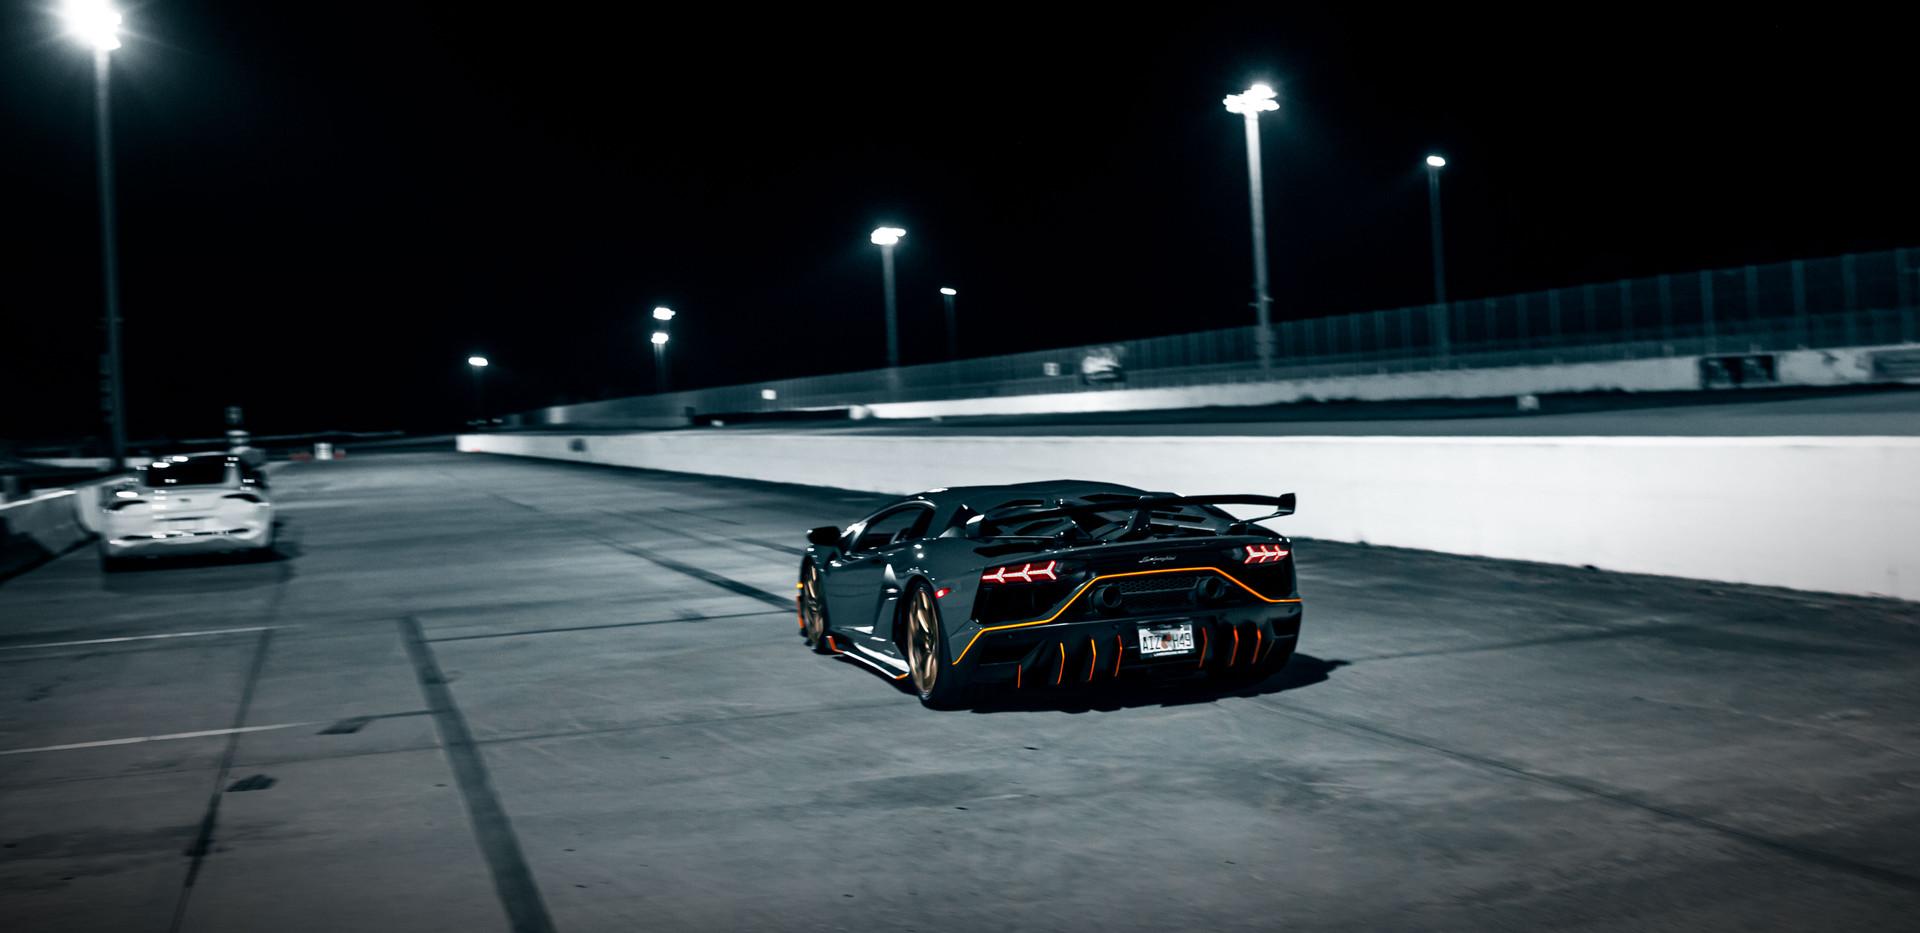 2020-10-8_Track_Night-43.jpg